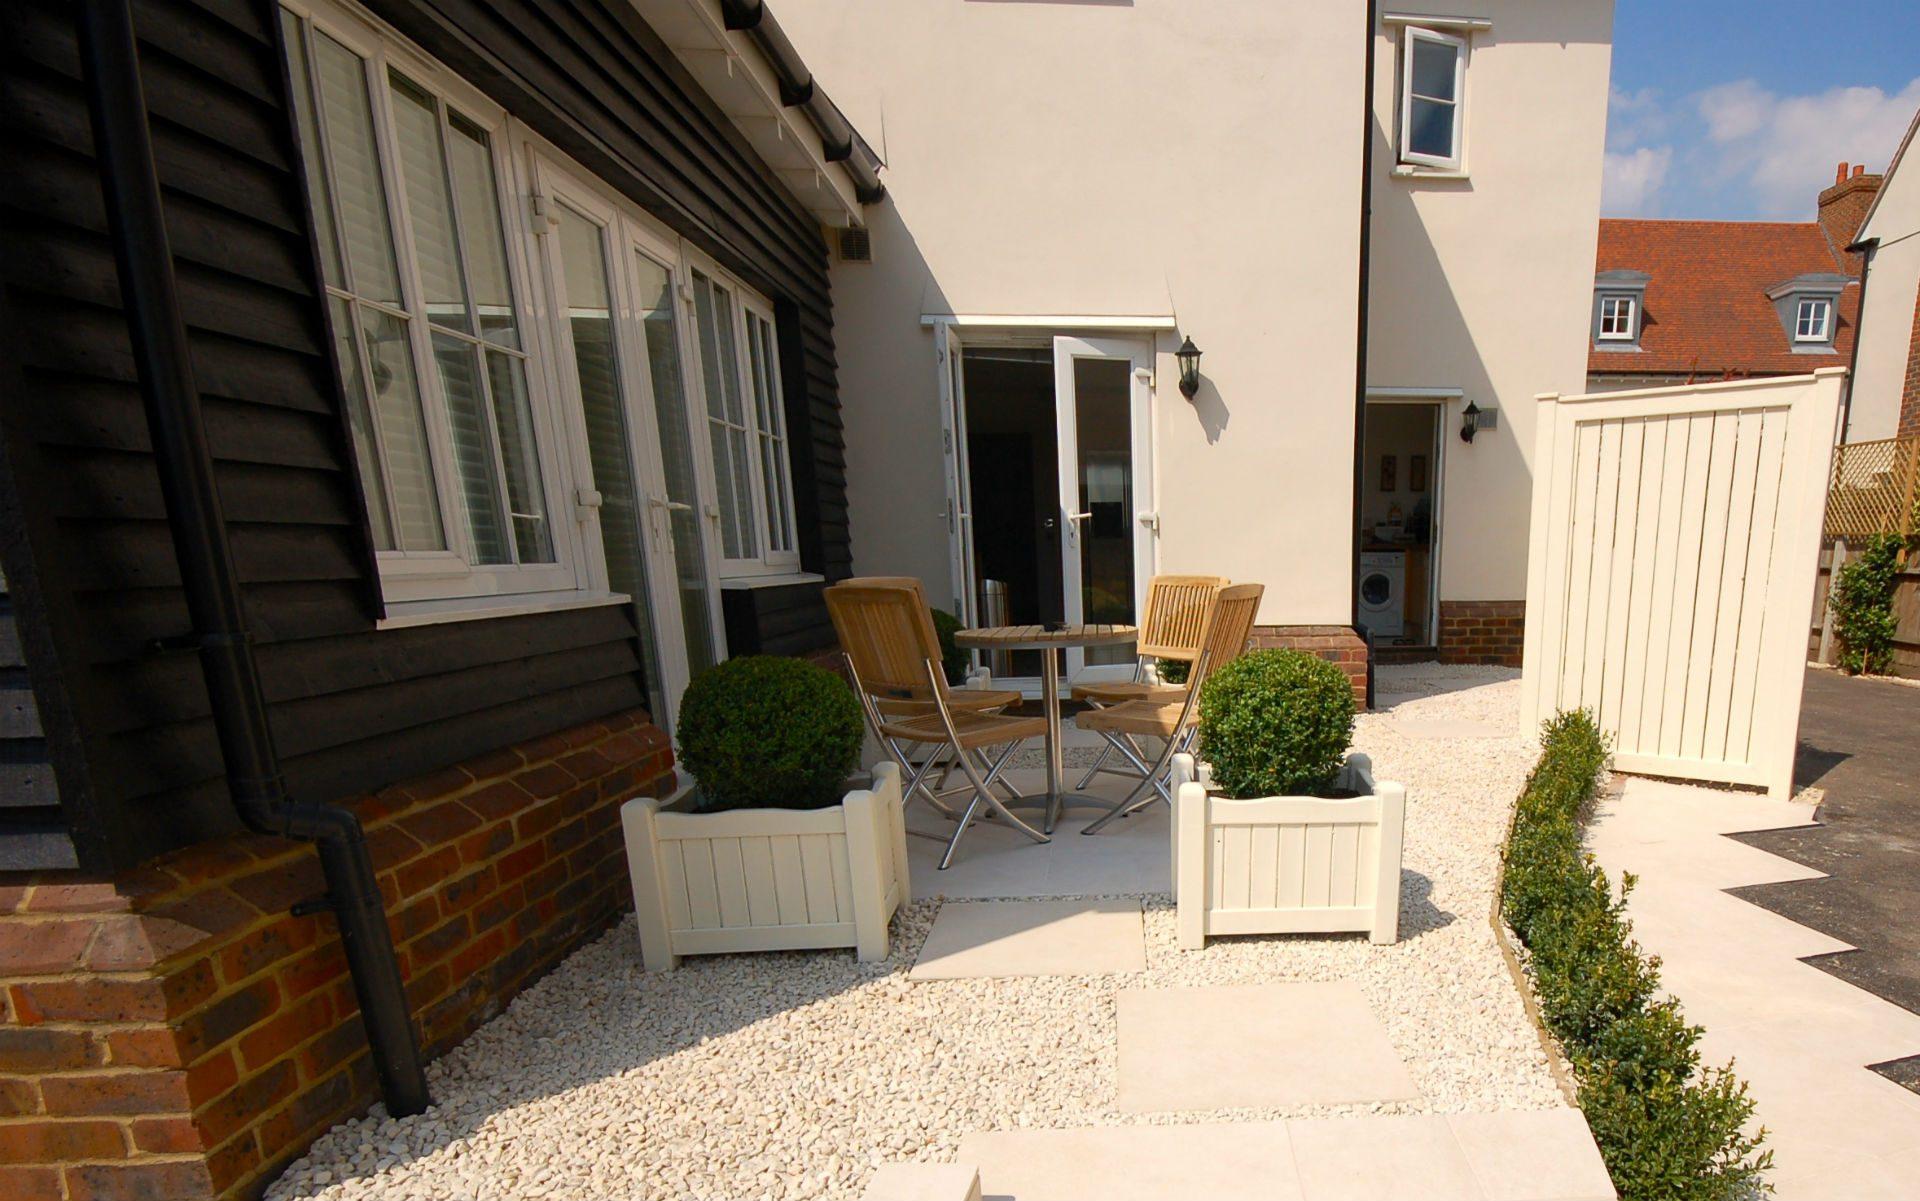 Contemporary Small Urban Garden Springfield Essex Courtyard to Front